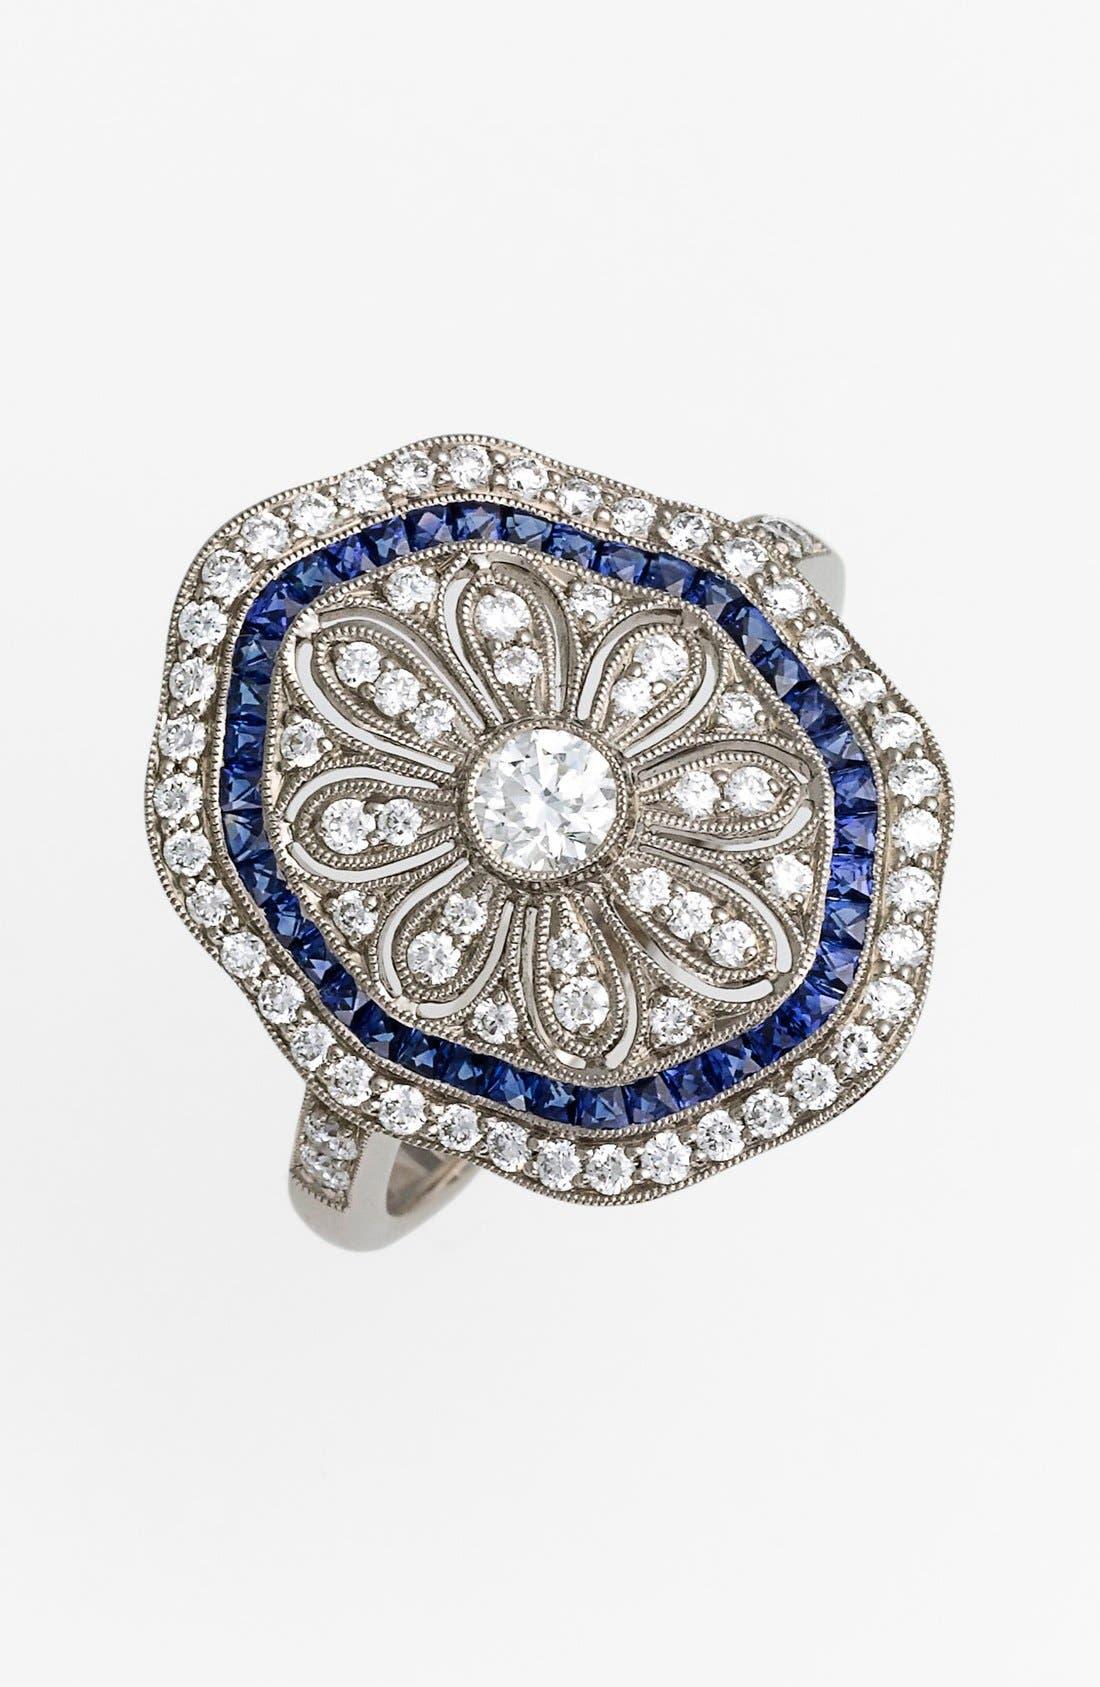 Main Image - Kwiat 'Vintage' Diamond & Blue Sapphire Octagon Ring